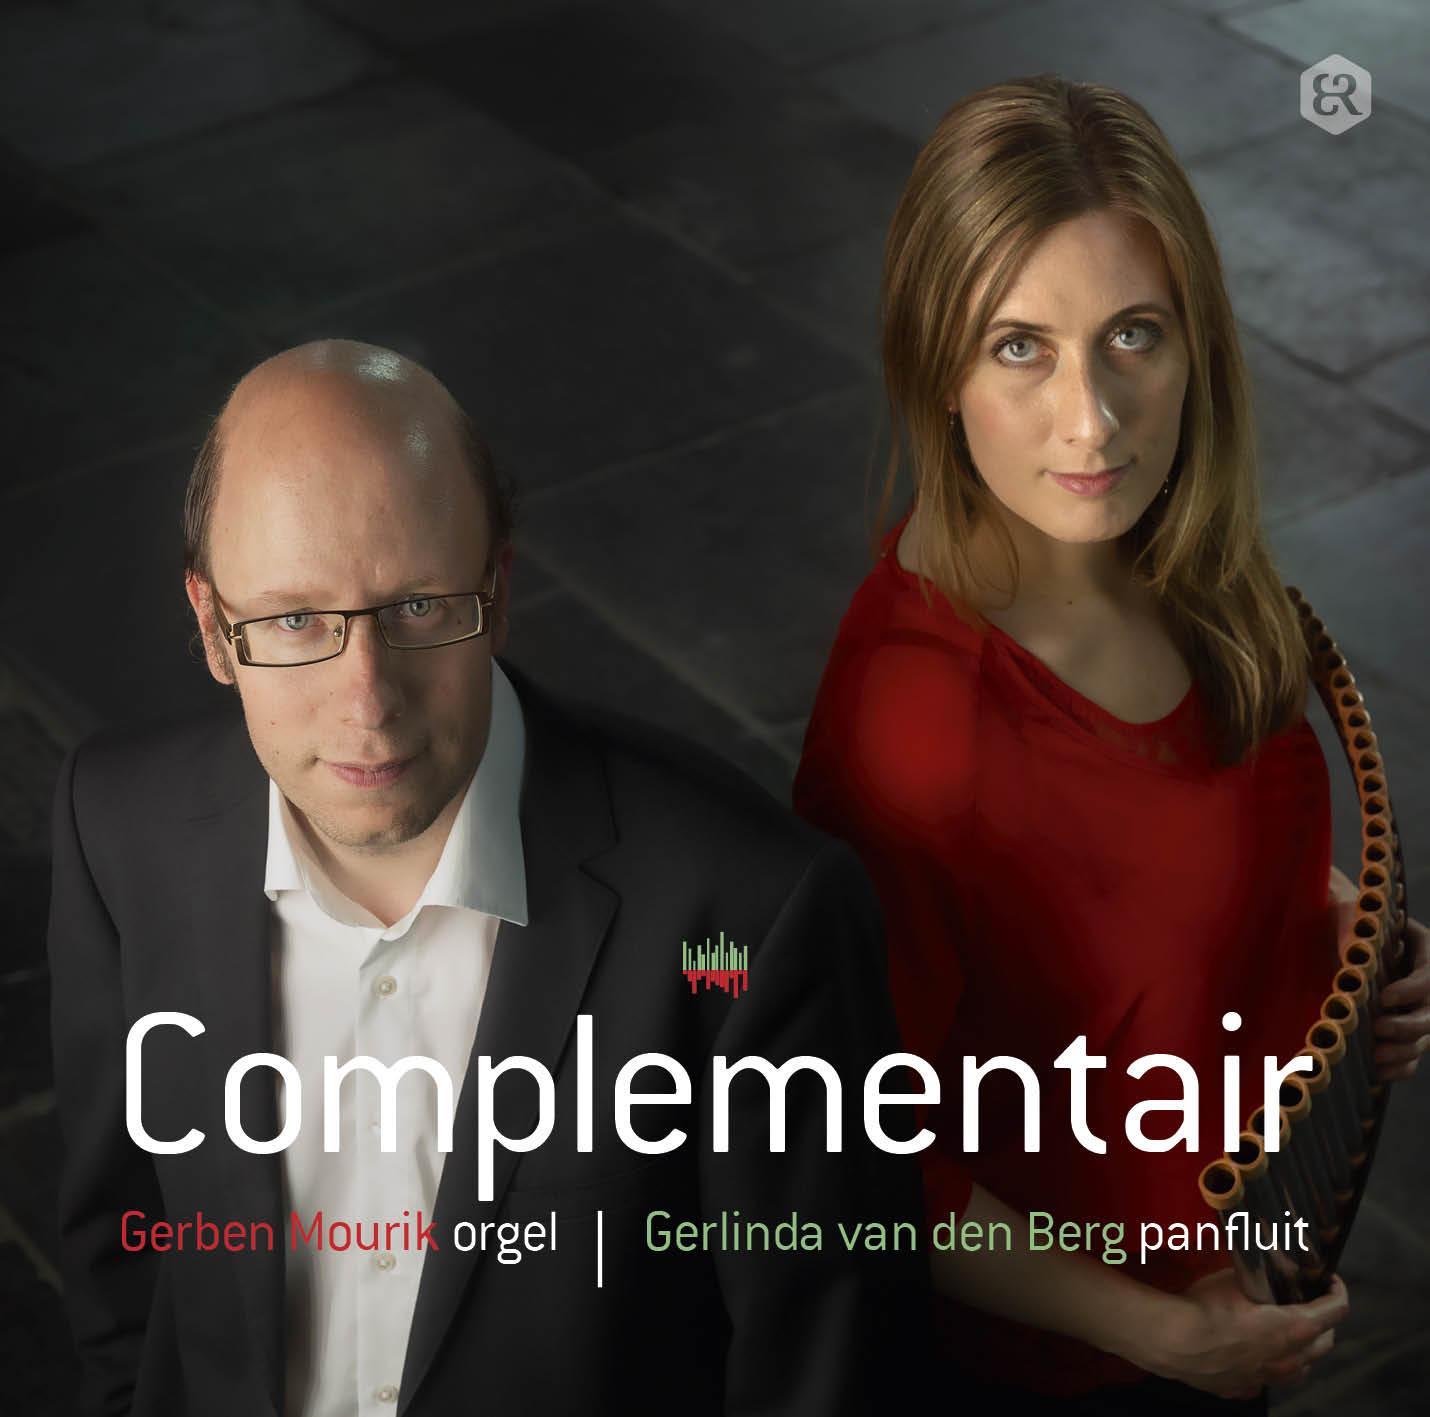 Er2015117-€-Er-cd-opmaak-Complementair_voorkant.jpg